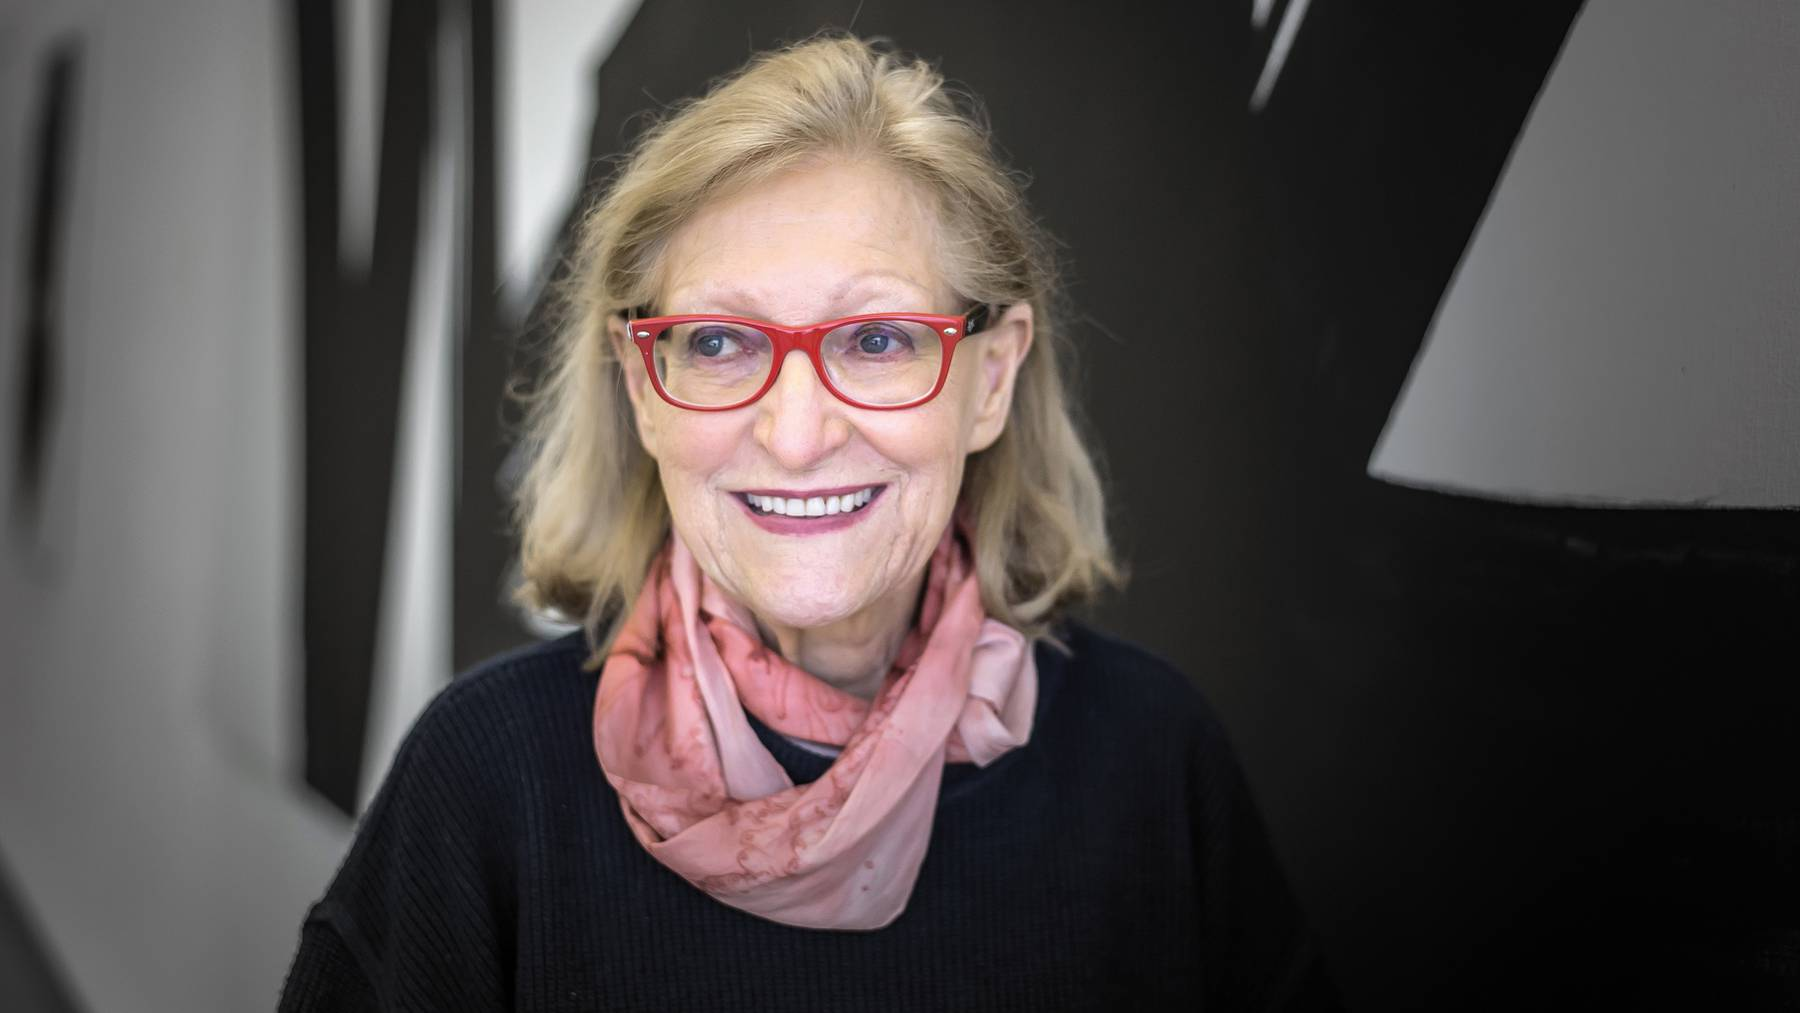 Roswitha Dörig